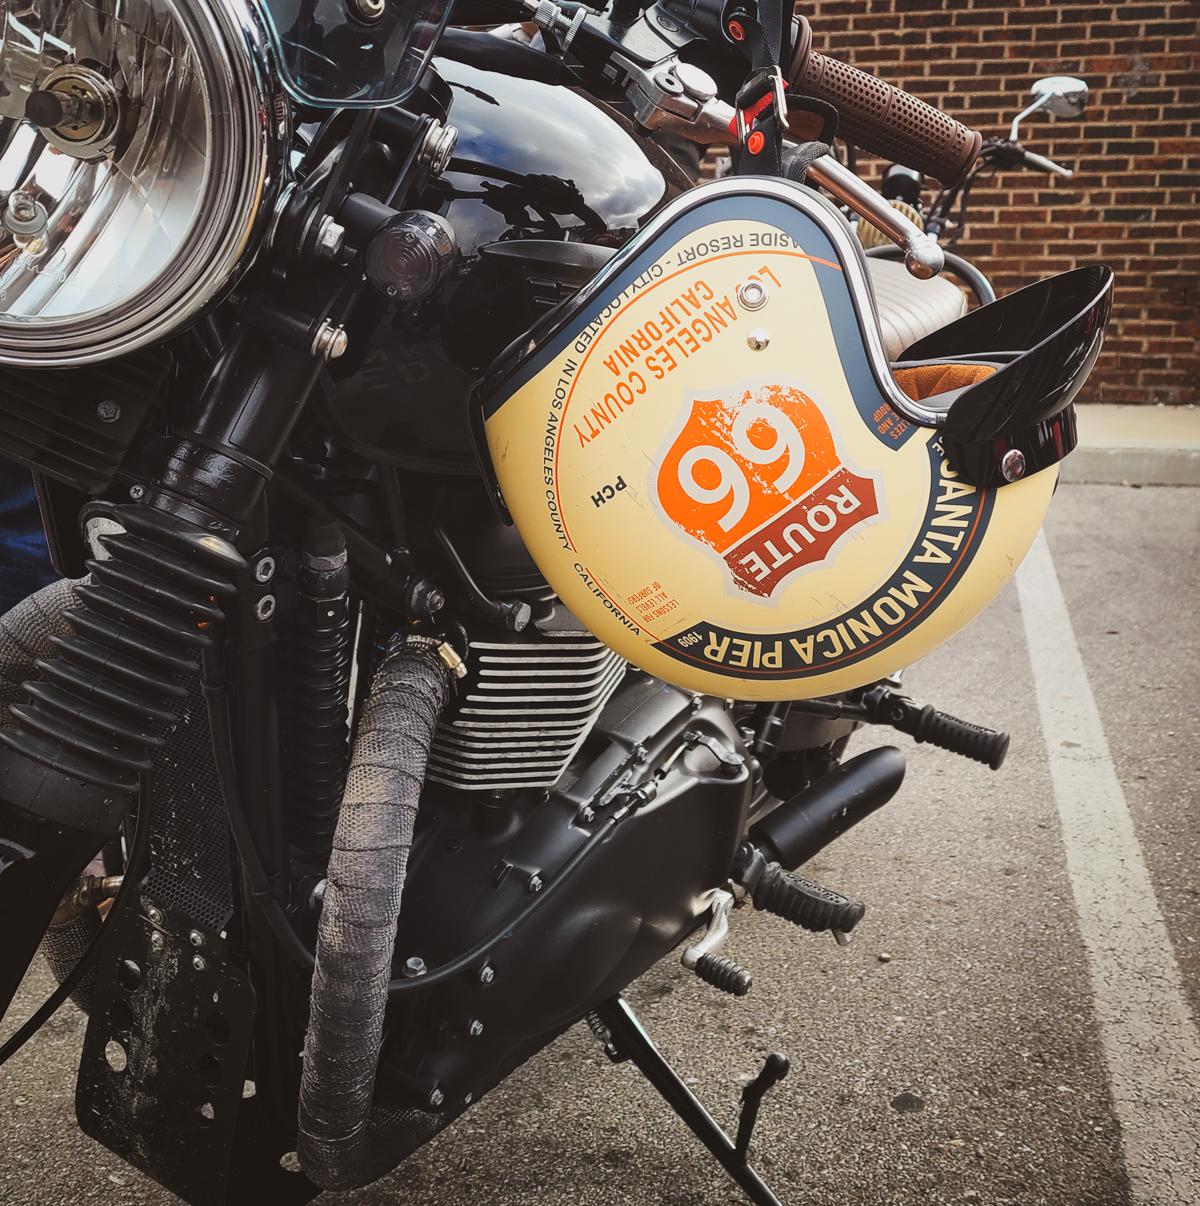 Dapper Ride for Gentlefolk |  September 27, 2020 | Indianapolis, IN. | Photo Credit: ©Pix Meyers 202020200927-DGR-IndianapolisIN-PixMeyers-12